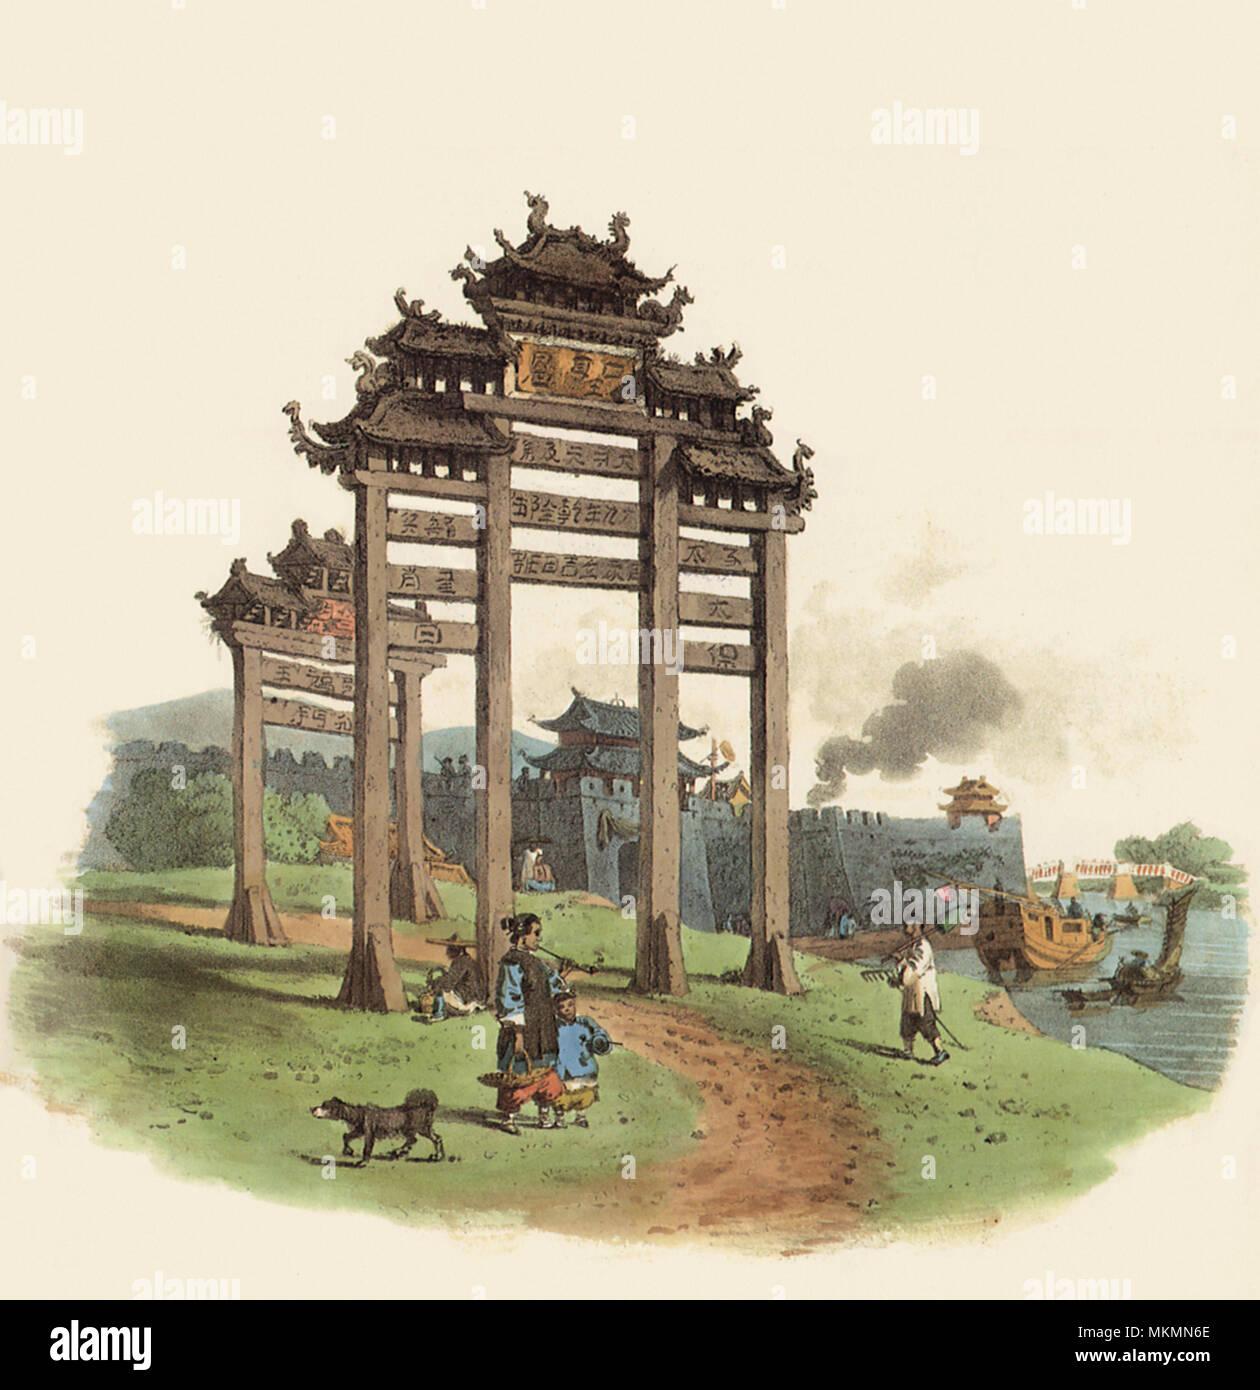 Triumphal Arches - Stock Image